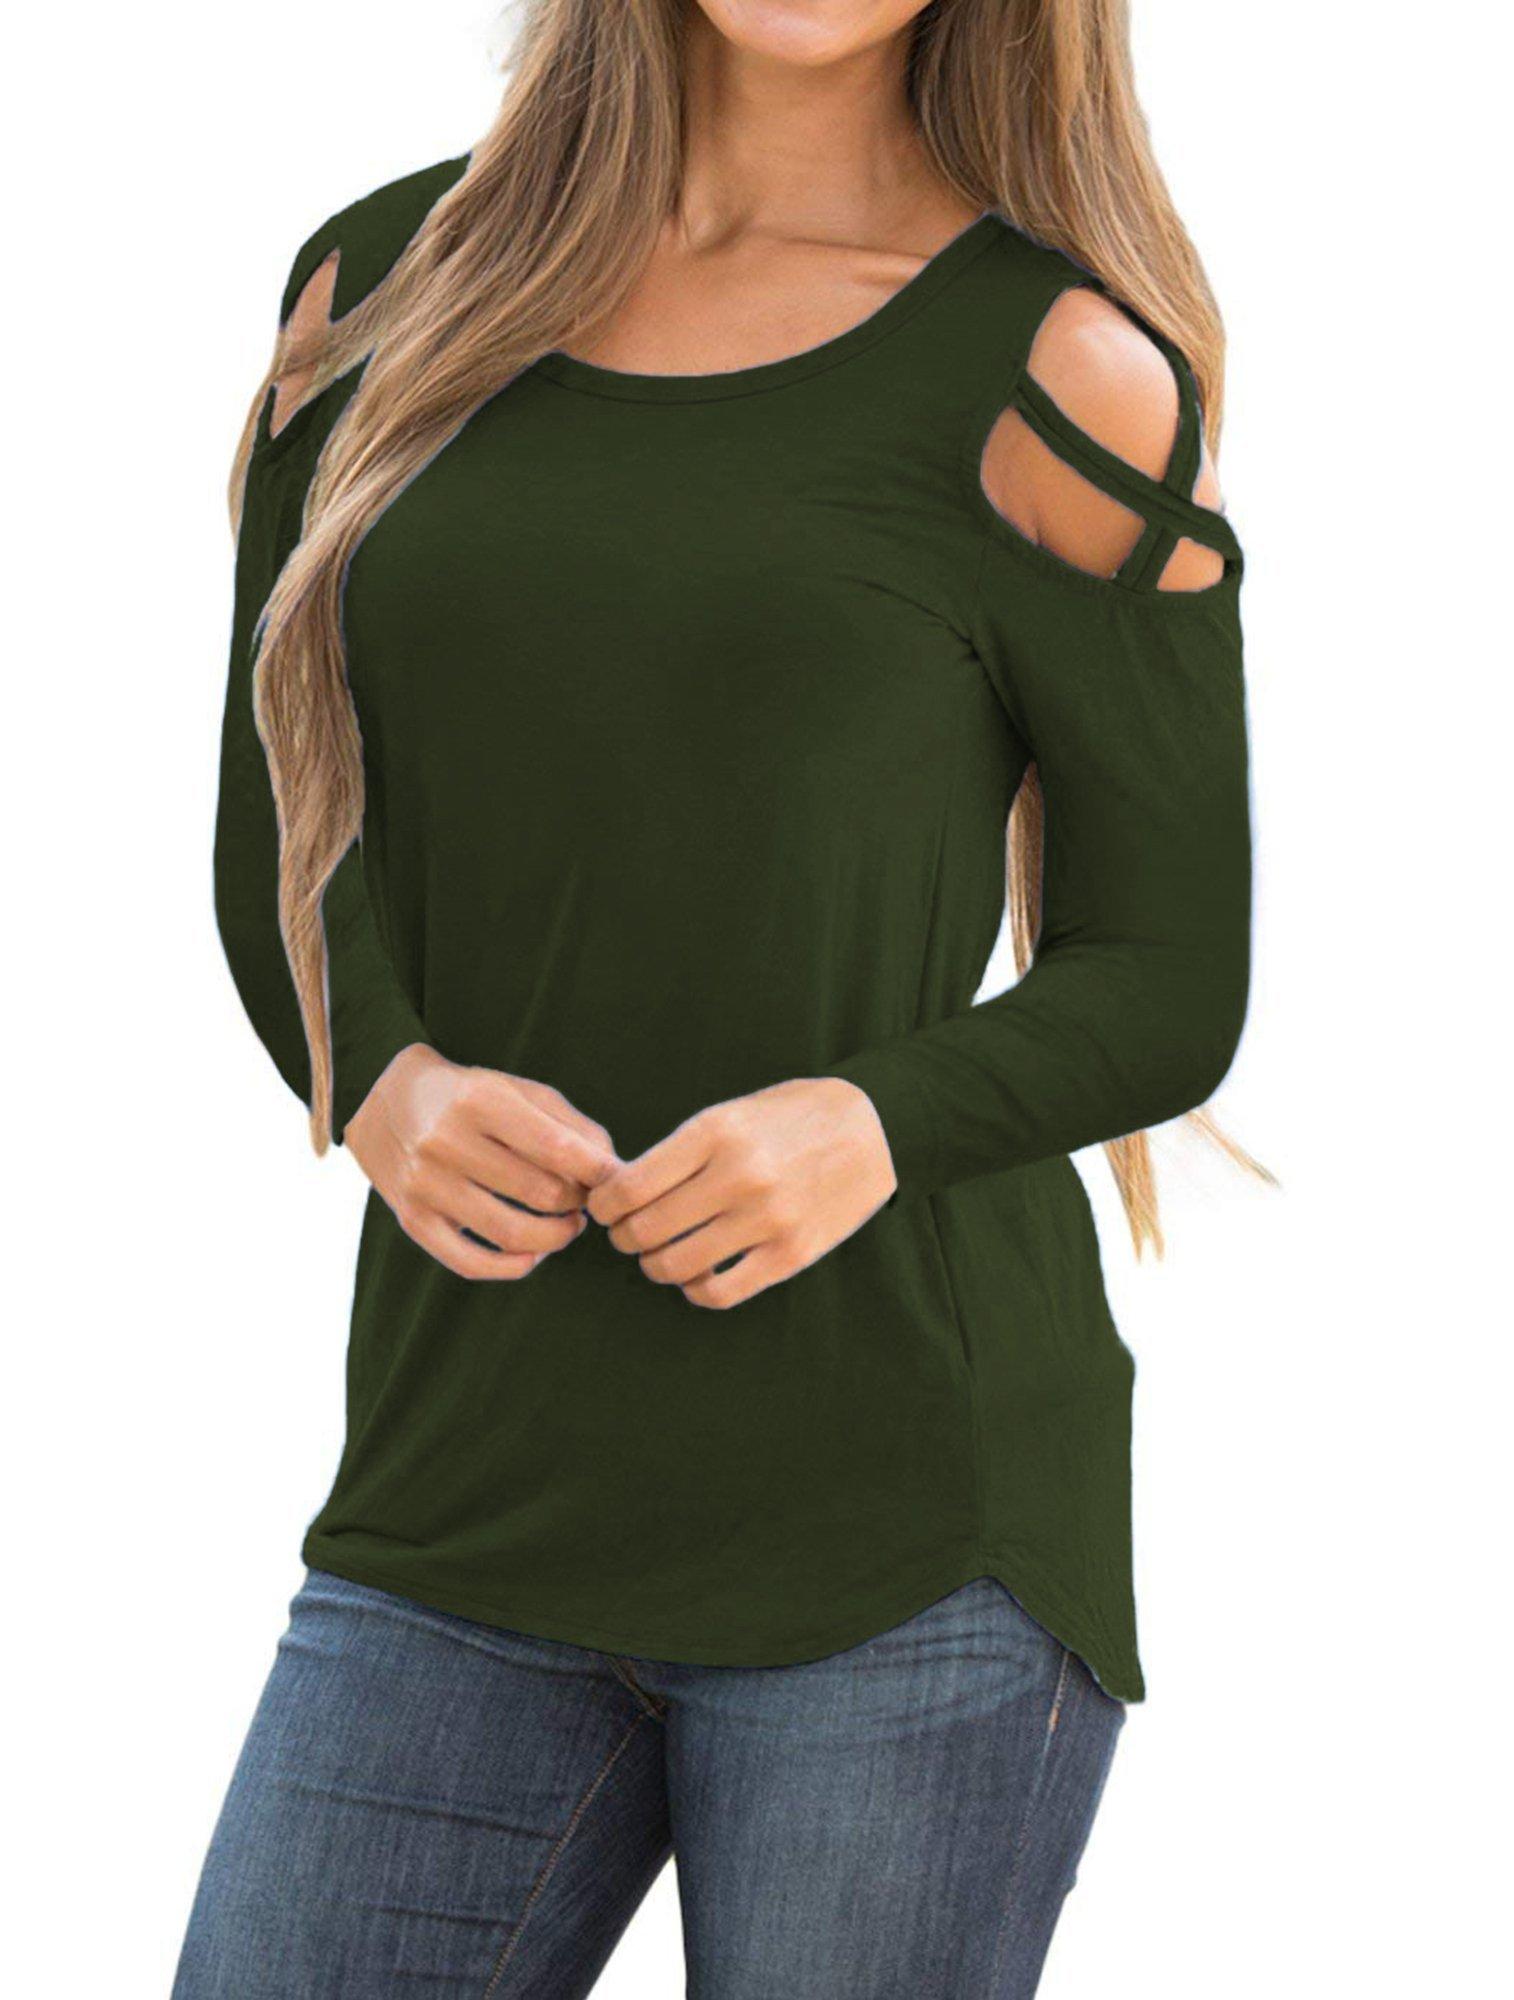 Sarin Mathews Womens Strappy Cold Shoulder Long Sleeve Tunic Tops Casual Loose Basic T Shirts ArmyGreen XL by Sarin Mathews (Image #2)